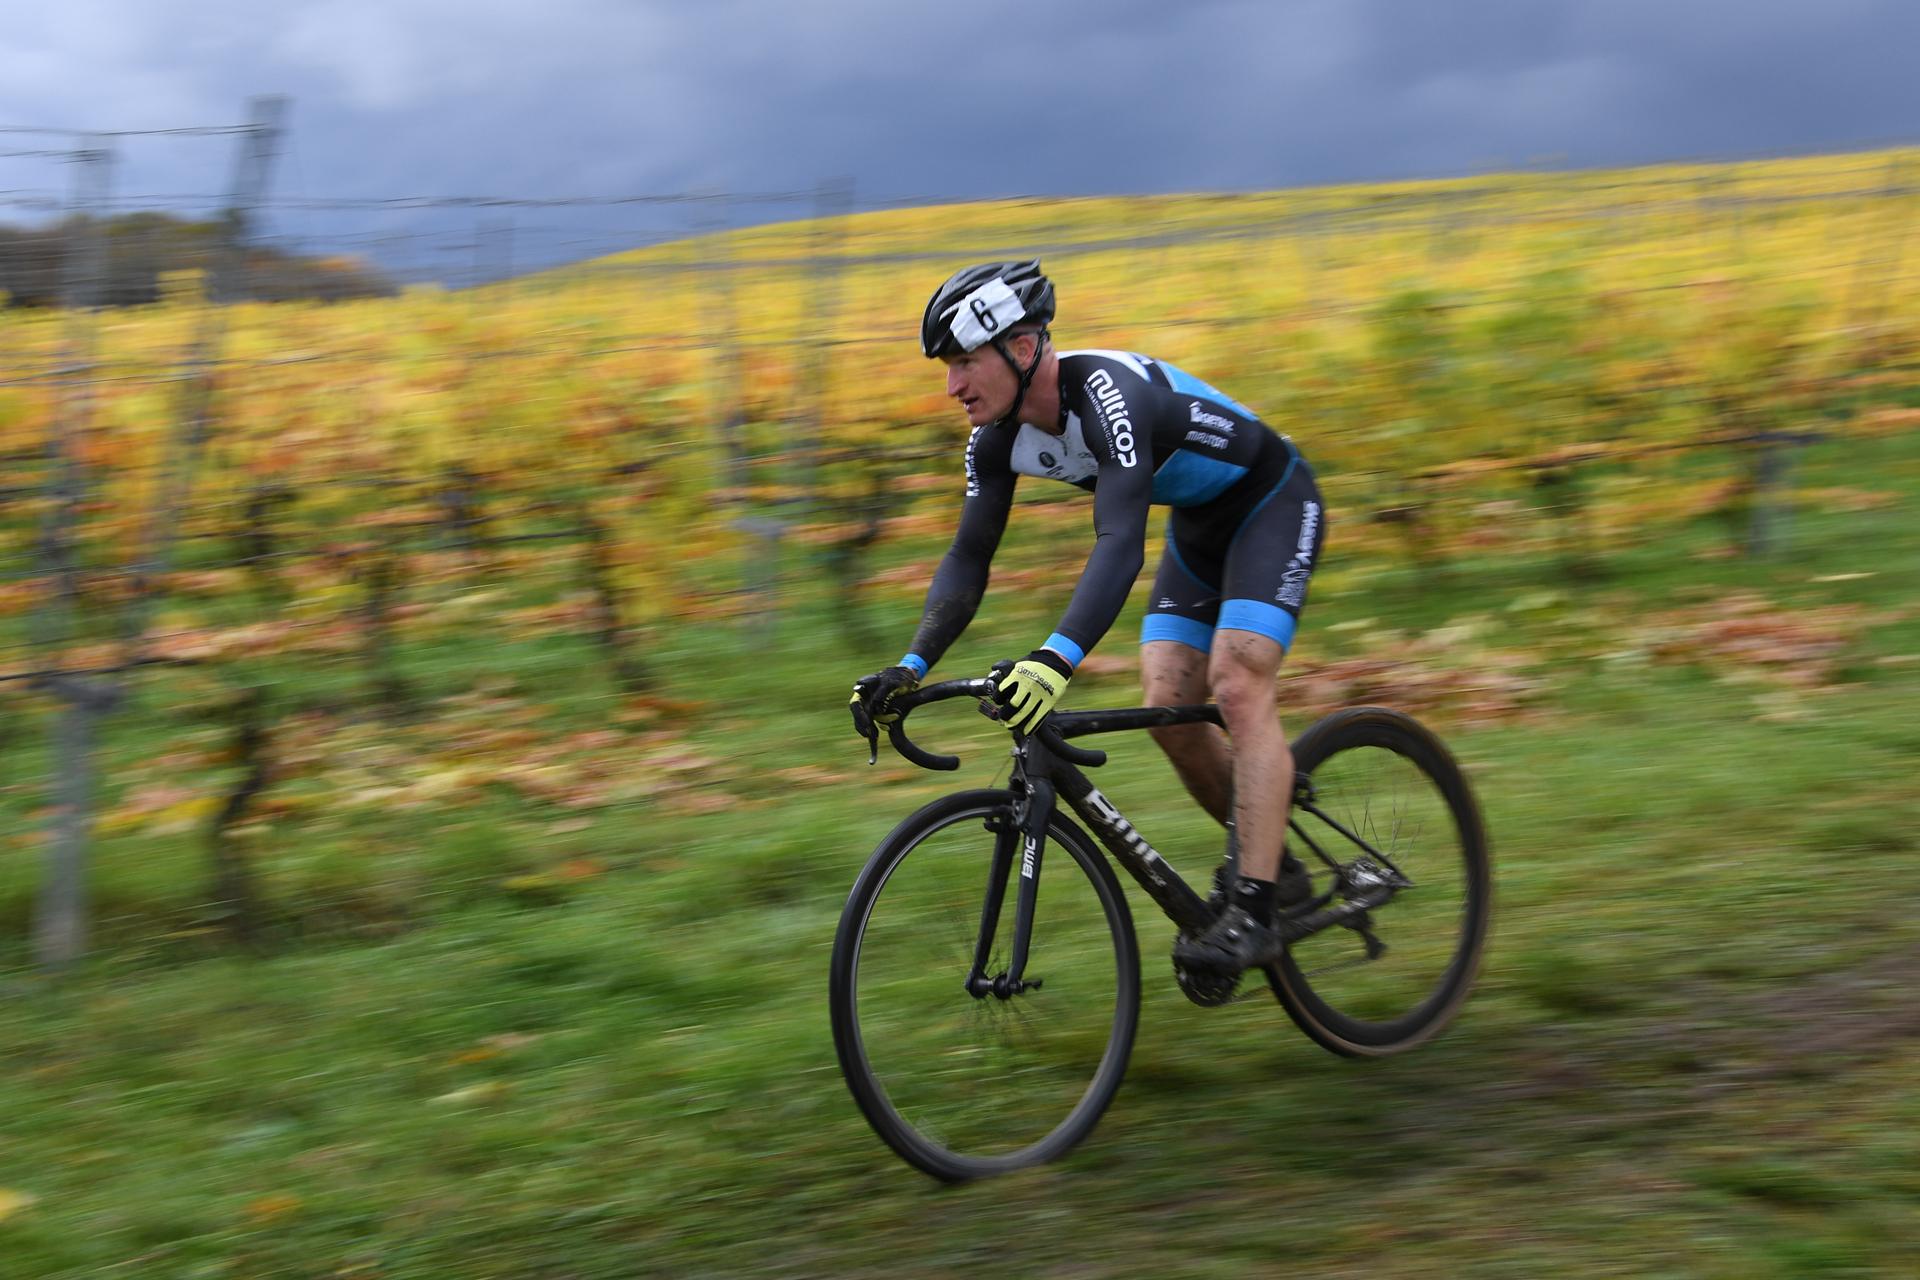 Maxime Beney, vainqueur de la première manche en licencié cyclo-cross (photo Bernard Sarbach)